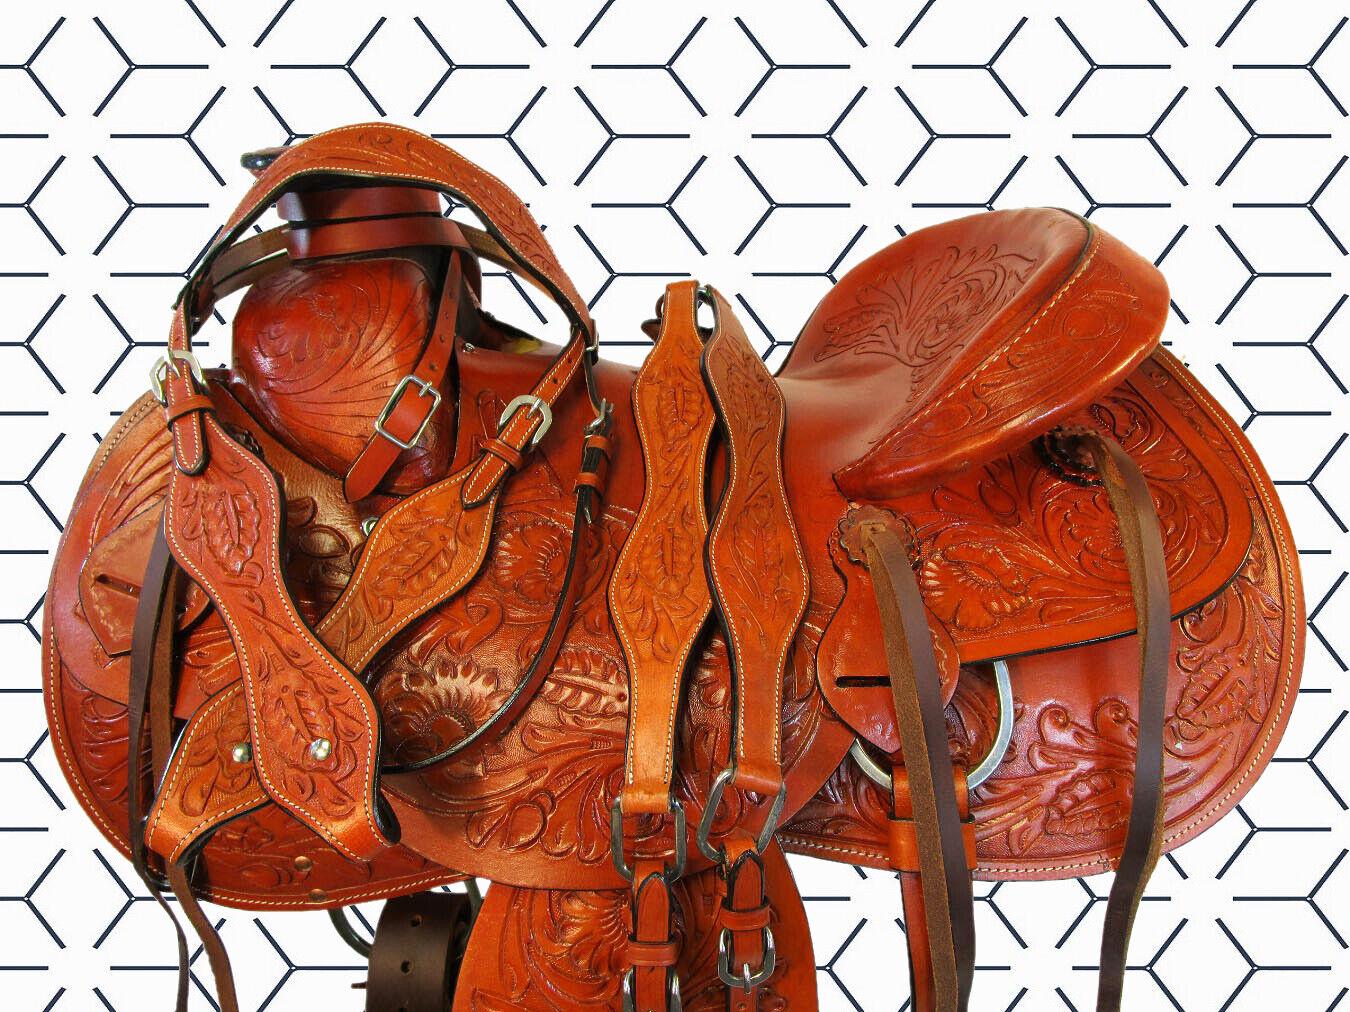 Western Floral labrada de Cuero Rancho Roper amarrar Caballo Wade Rodeo silla 16 17